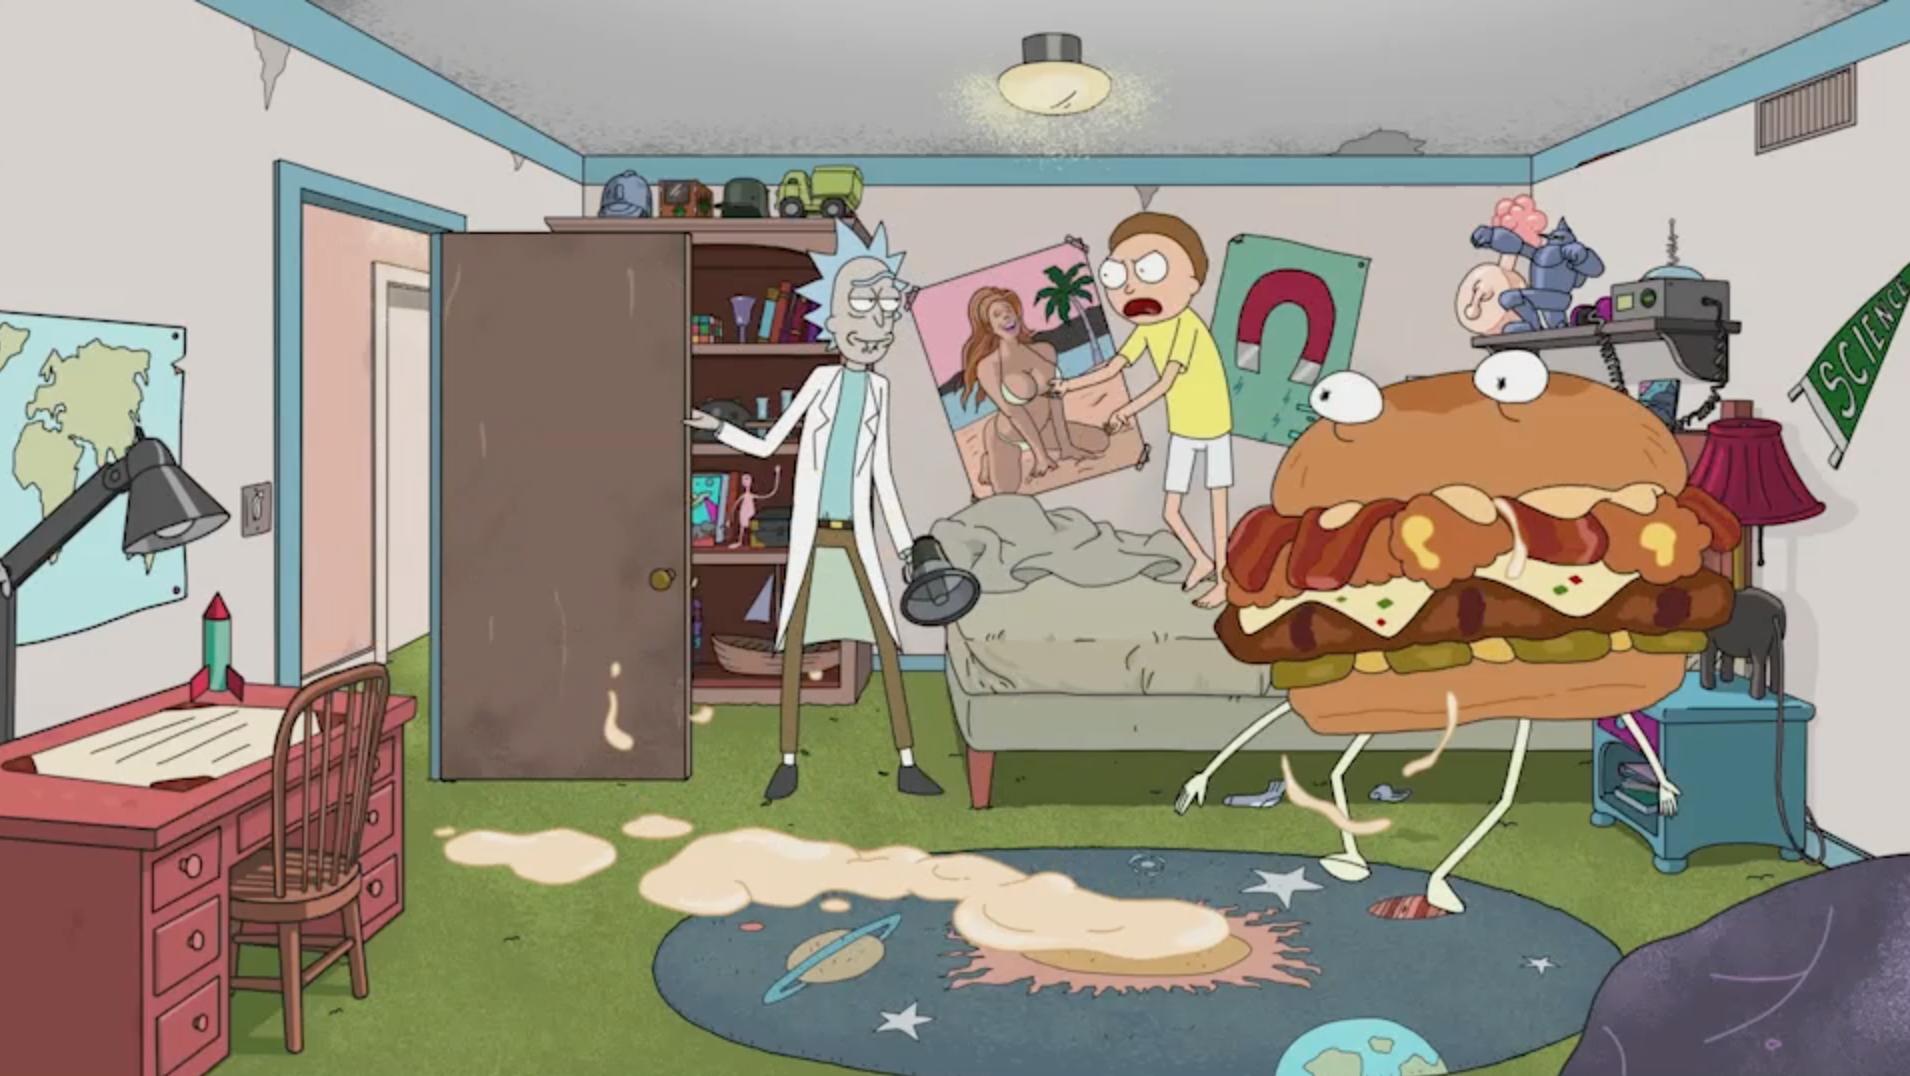 CURATING & MANAGING BRAND PARTNERS Carl's Jr. + Rick & Morty and Aqua Teen Hunger Force